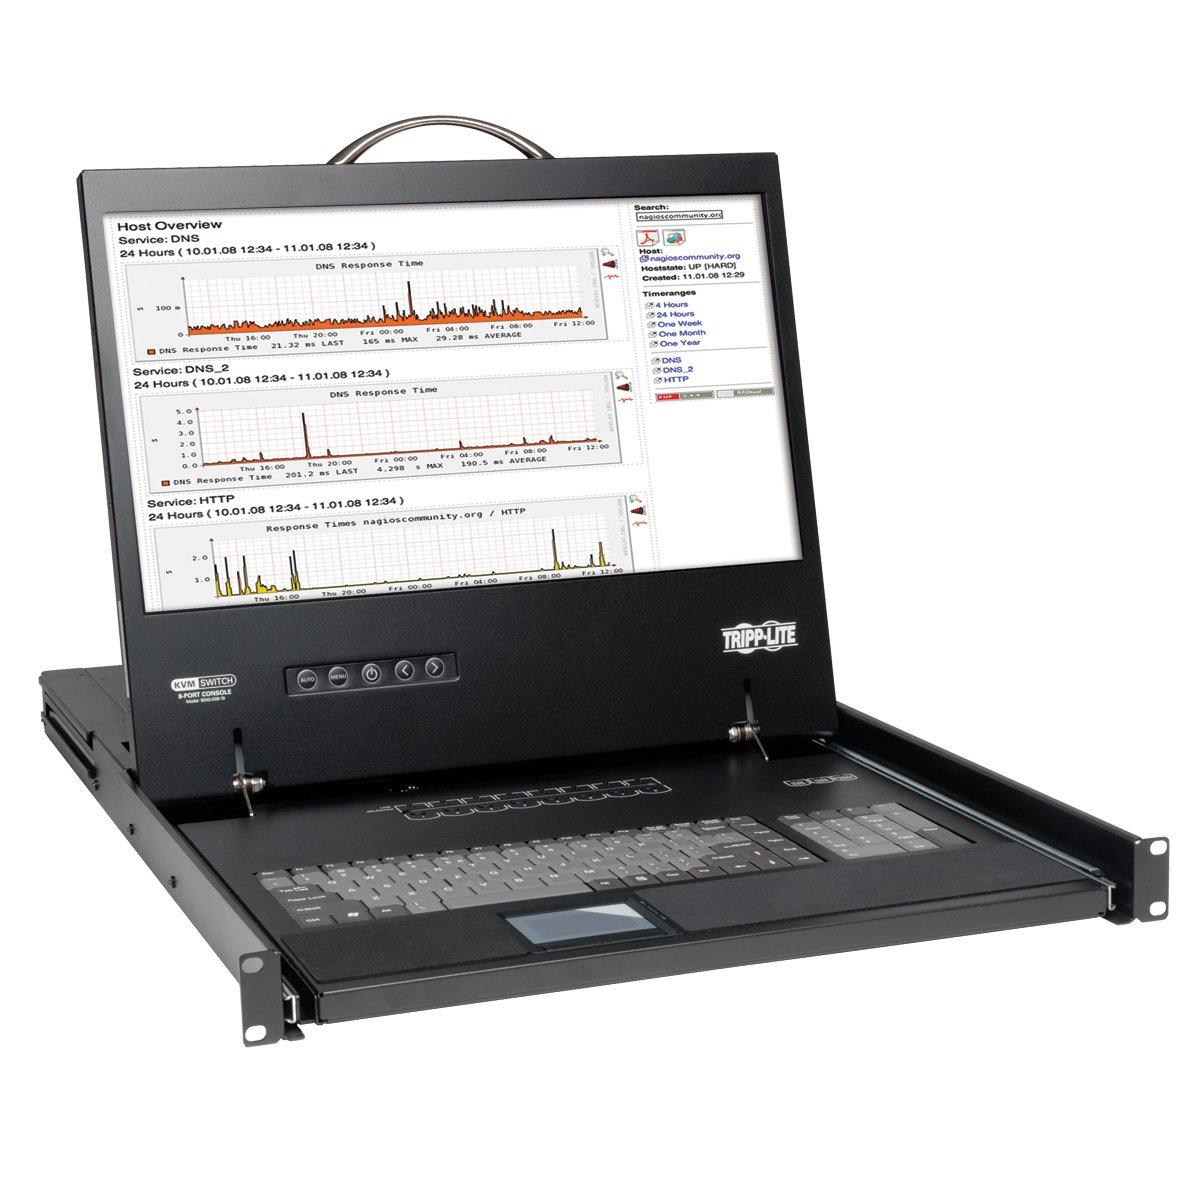 Tripp Lite B040-016-19 16 Port VGA KVM Console w 19in LCD Monitor Keyboard Touchpad